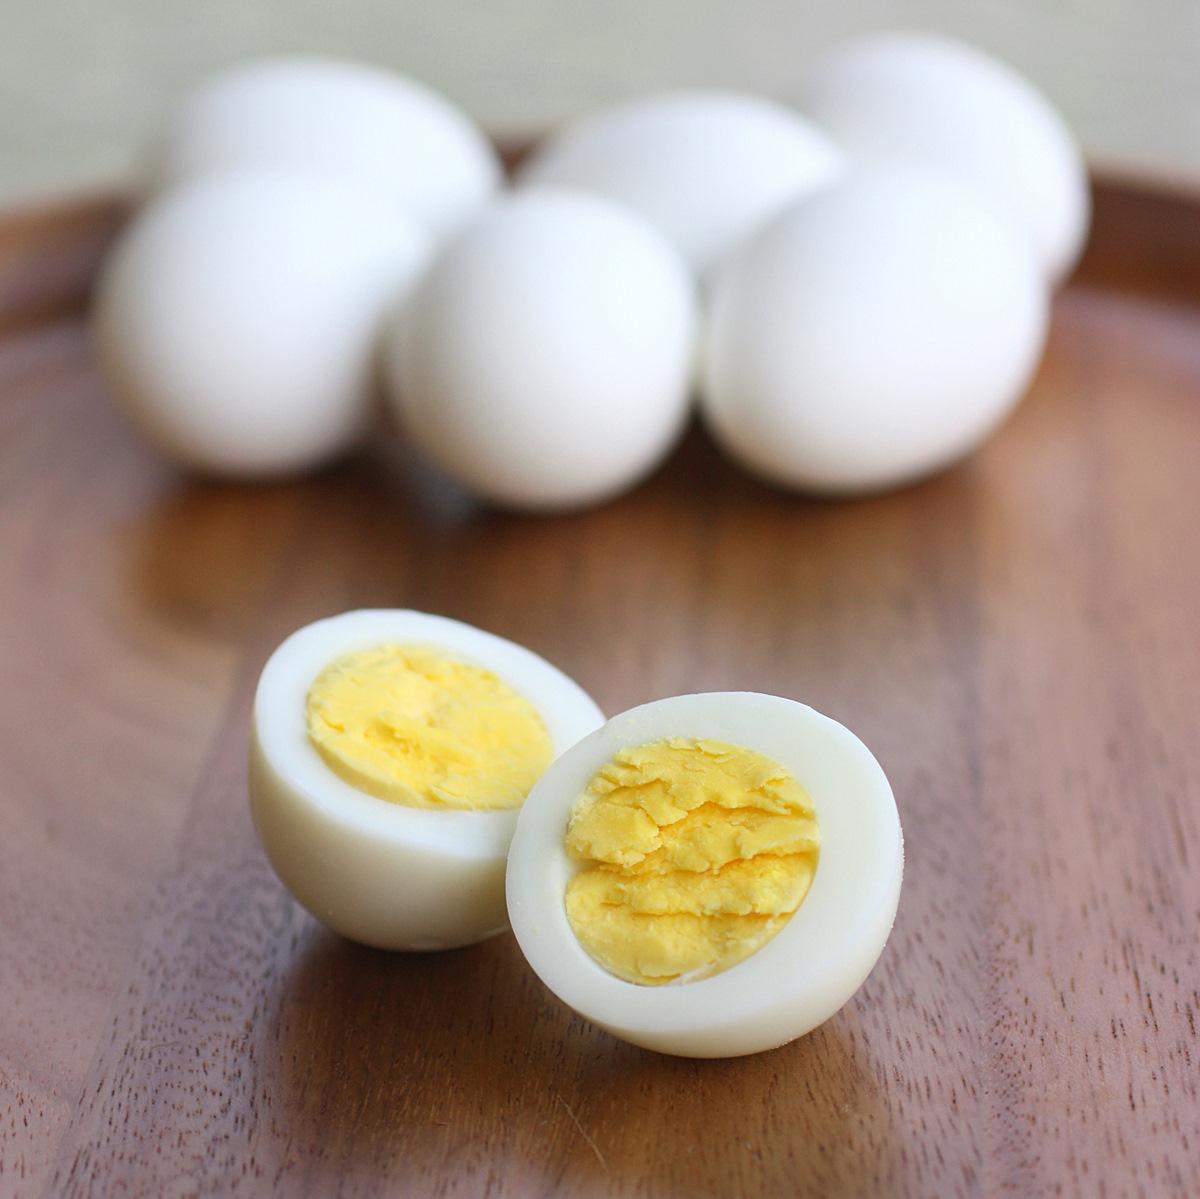 Eggceptionally Tasty and Healthy